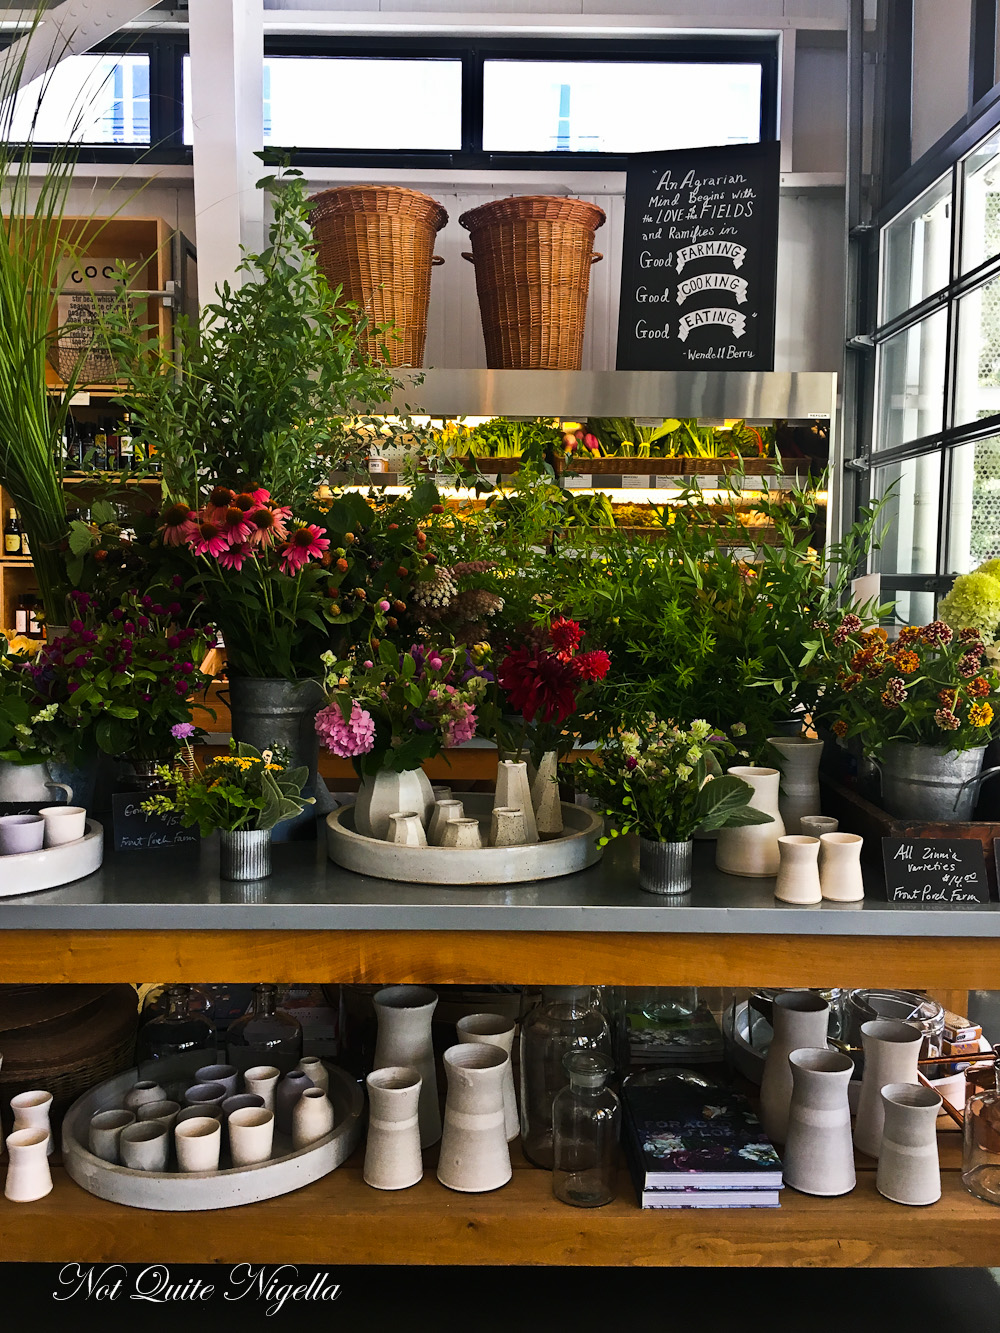 Healdsburg Culinary Experiences